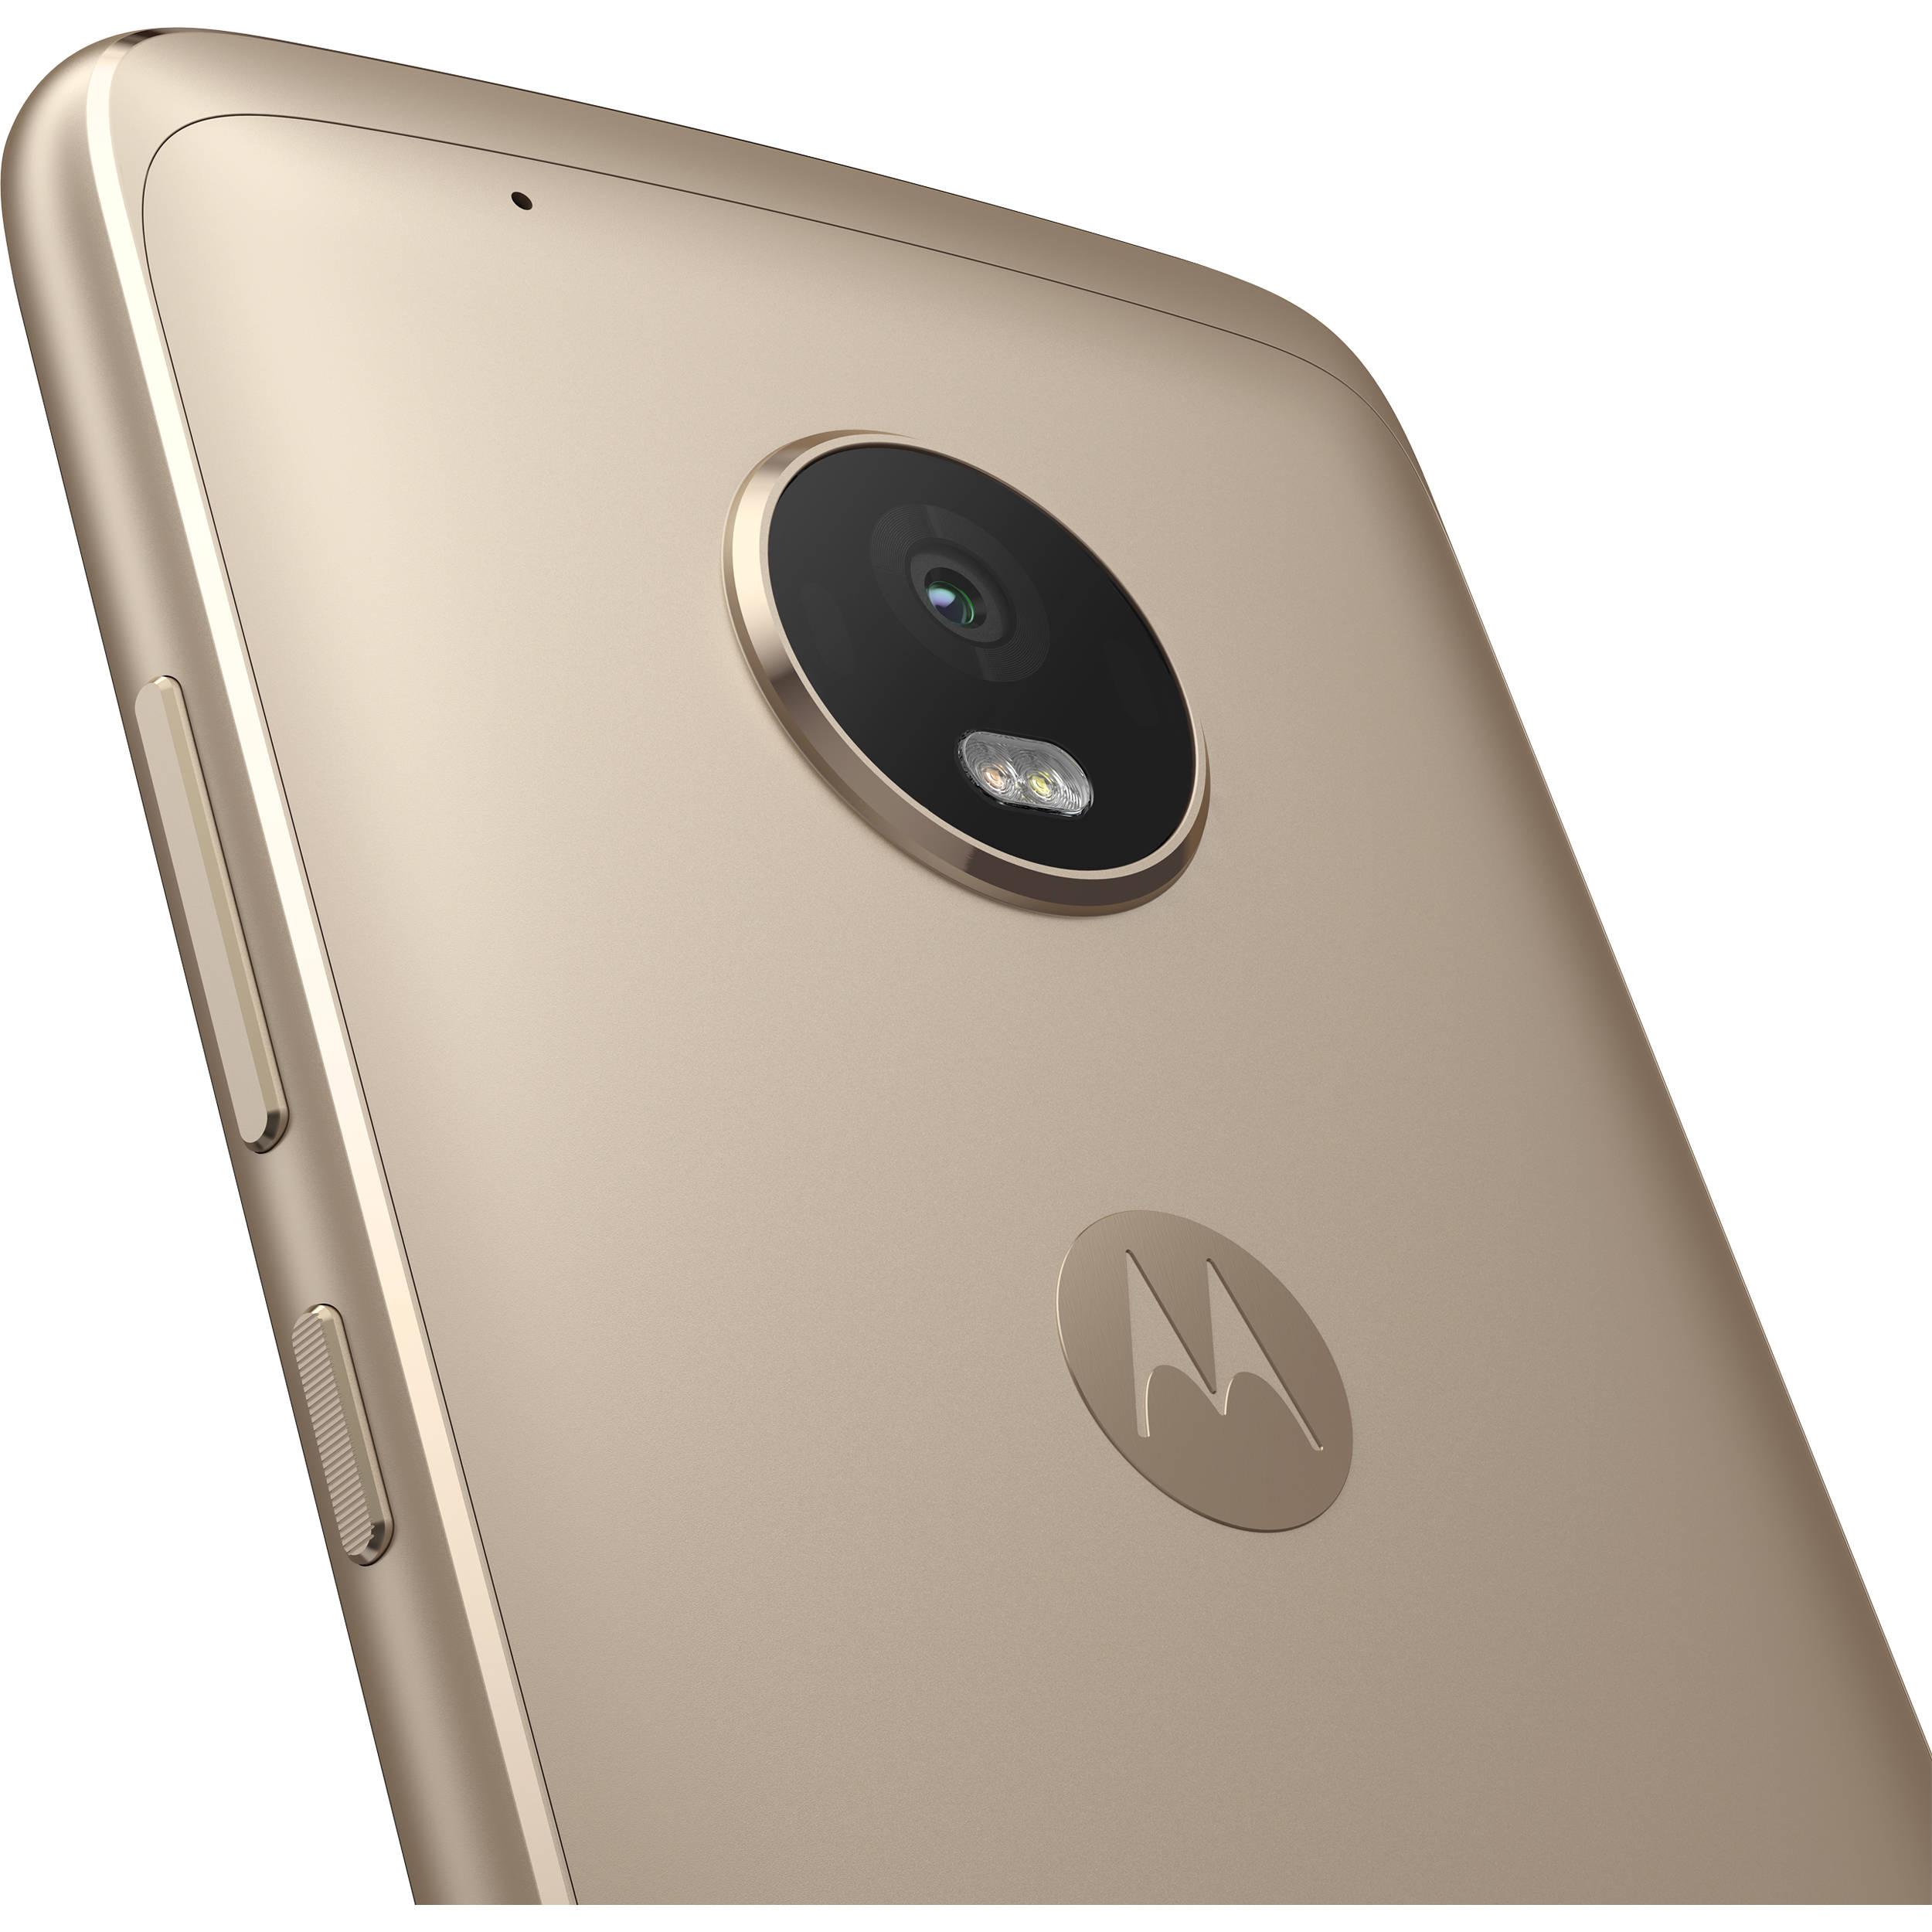 Moto G5 Plus XT1687 32GB Smartphone (Unlocked, Fine Gold)